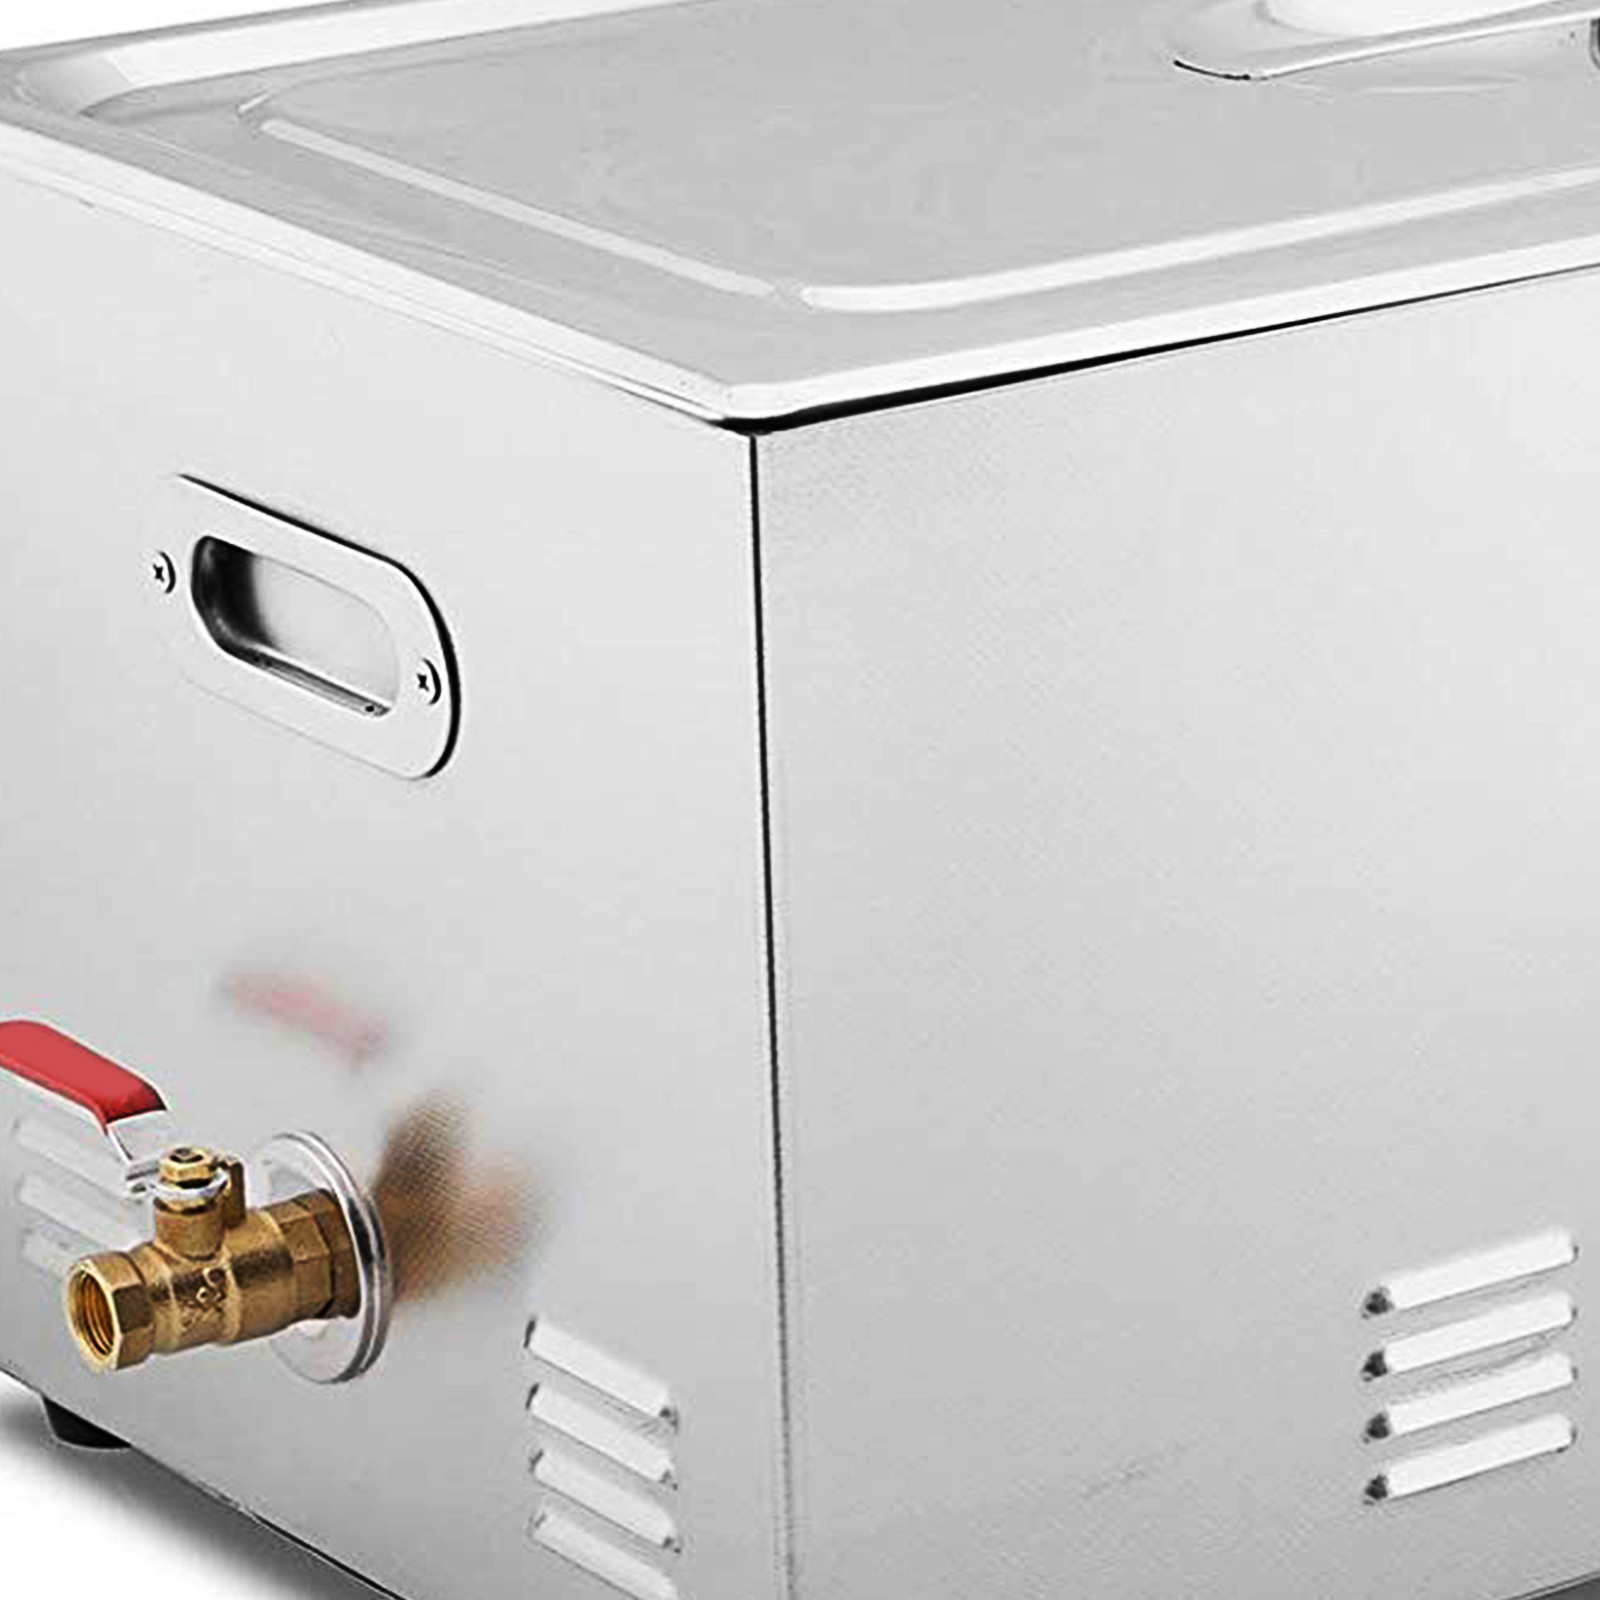 Vaschetta-Vasca-Ultrasuoni-Lavatrice-Pulitore-Ad-Ultrasuoni miniatura 102